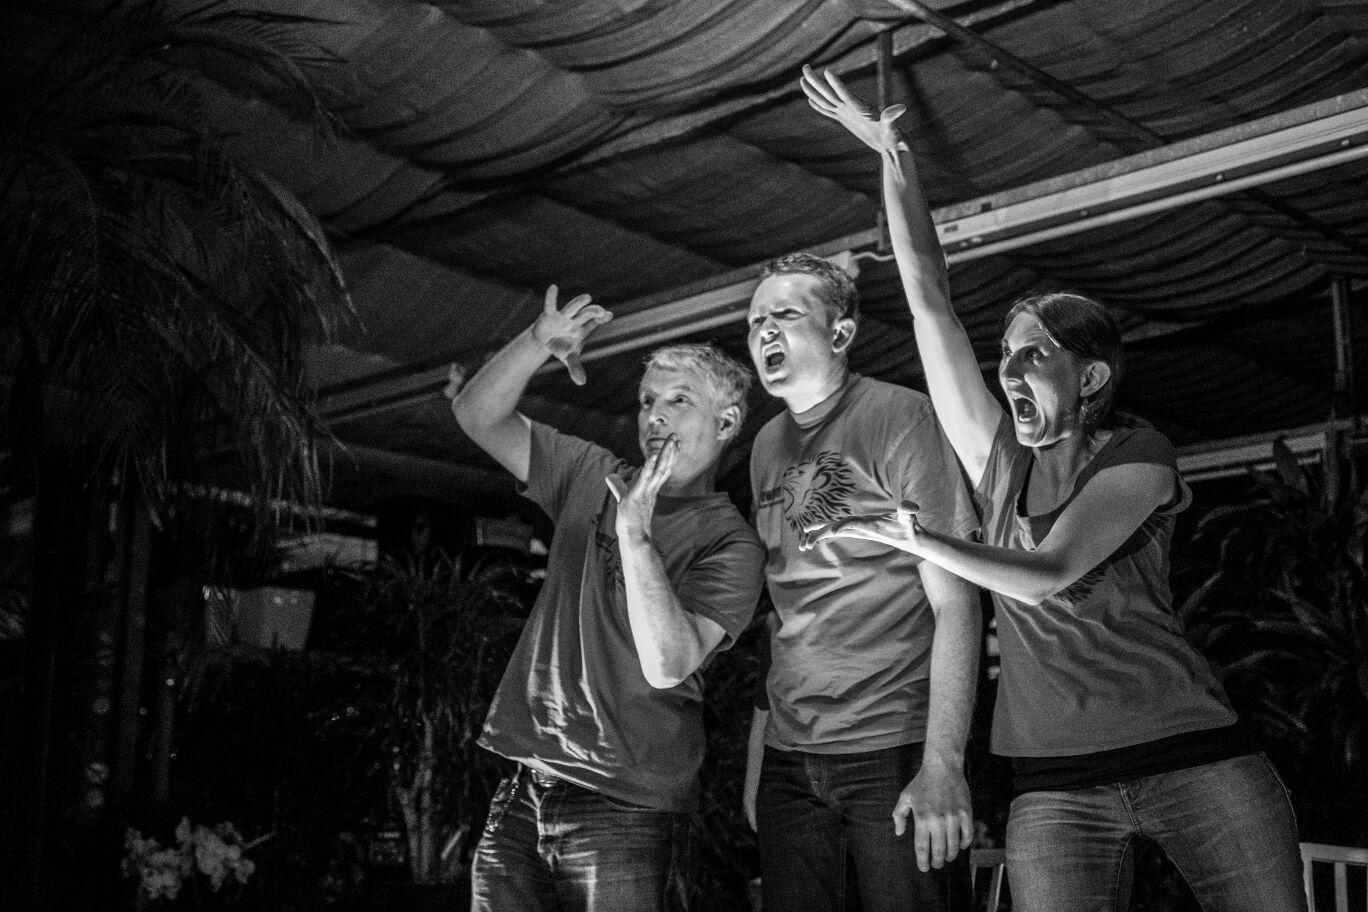 Fotogalerie zu Impro im Regenwald